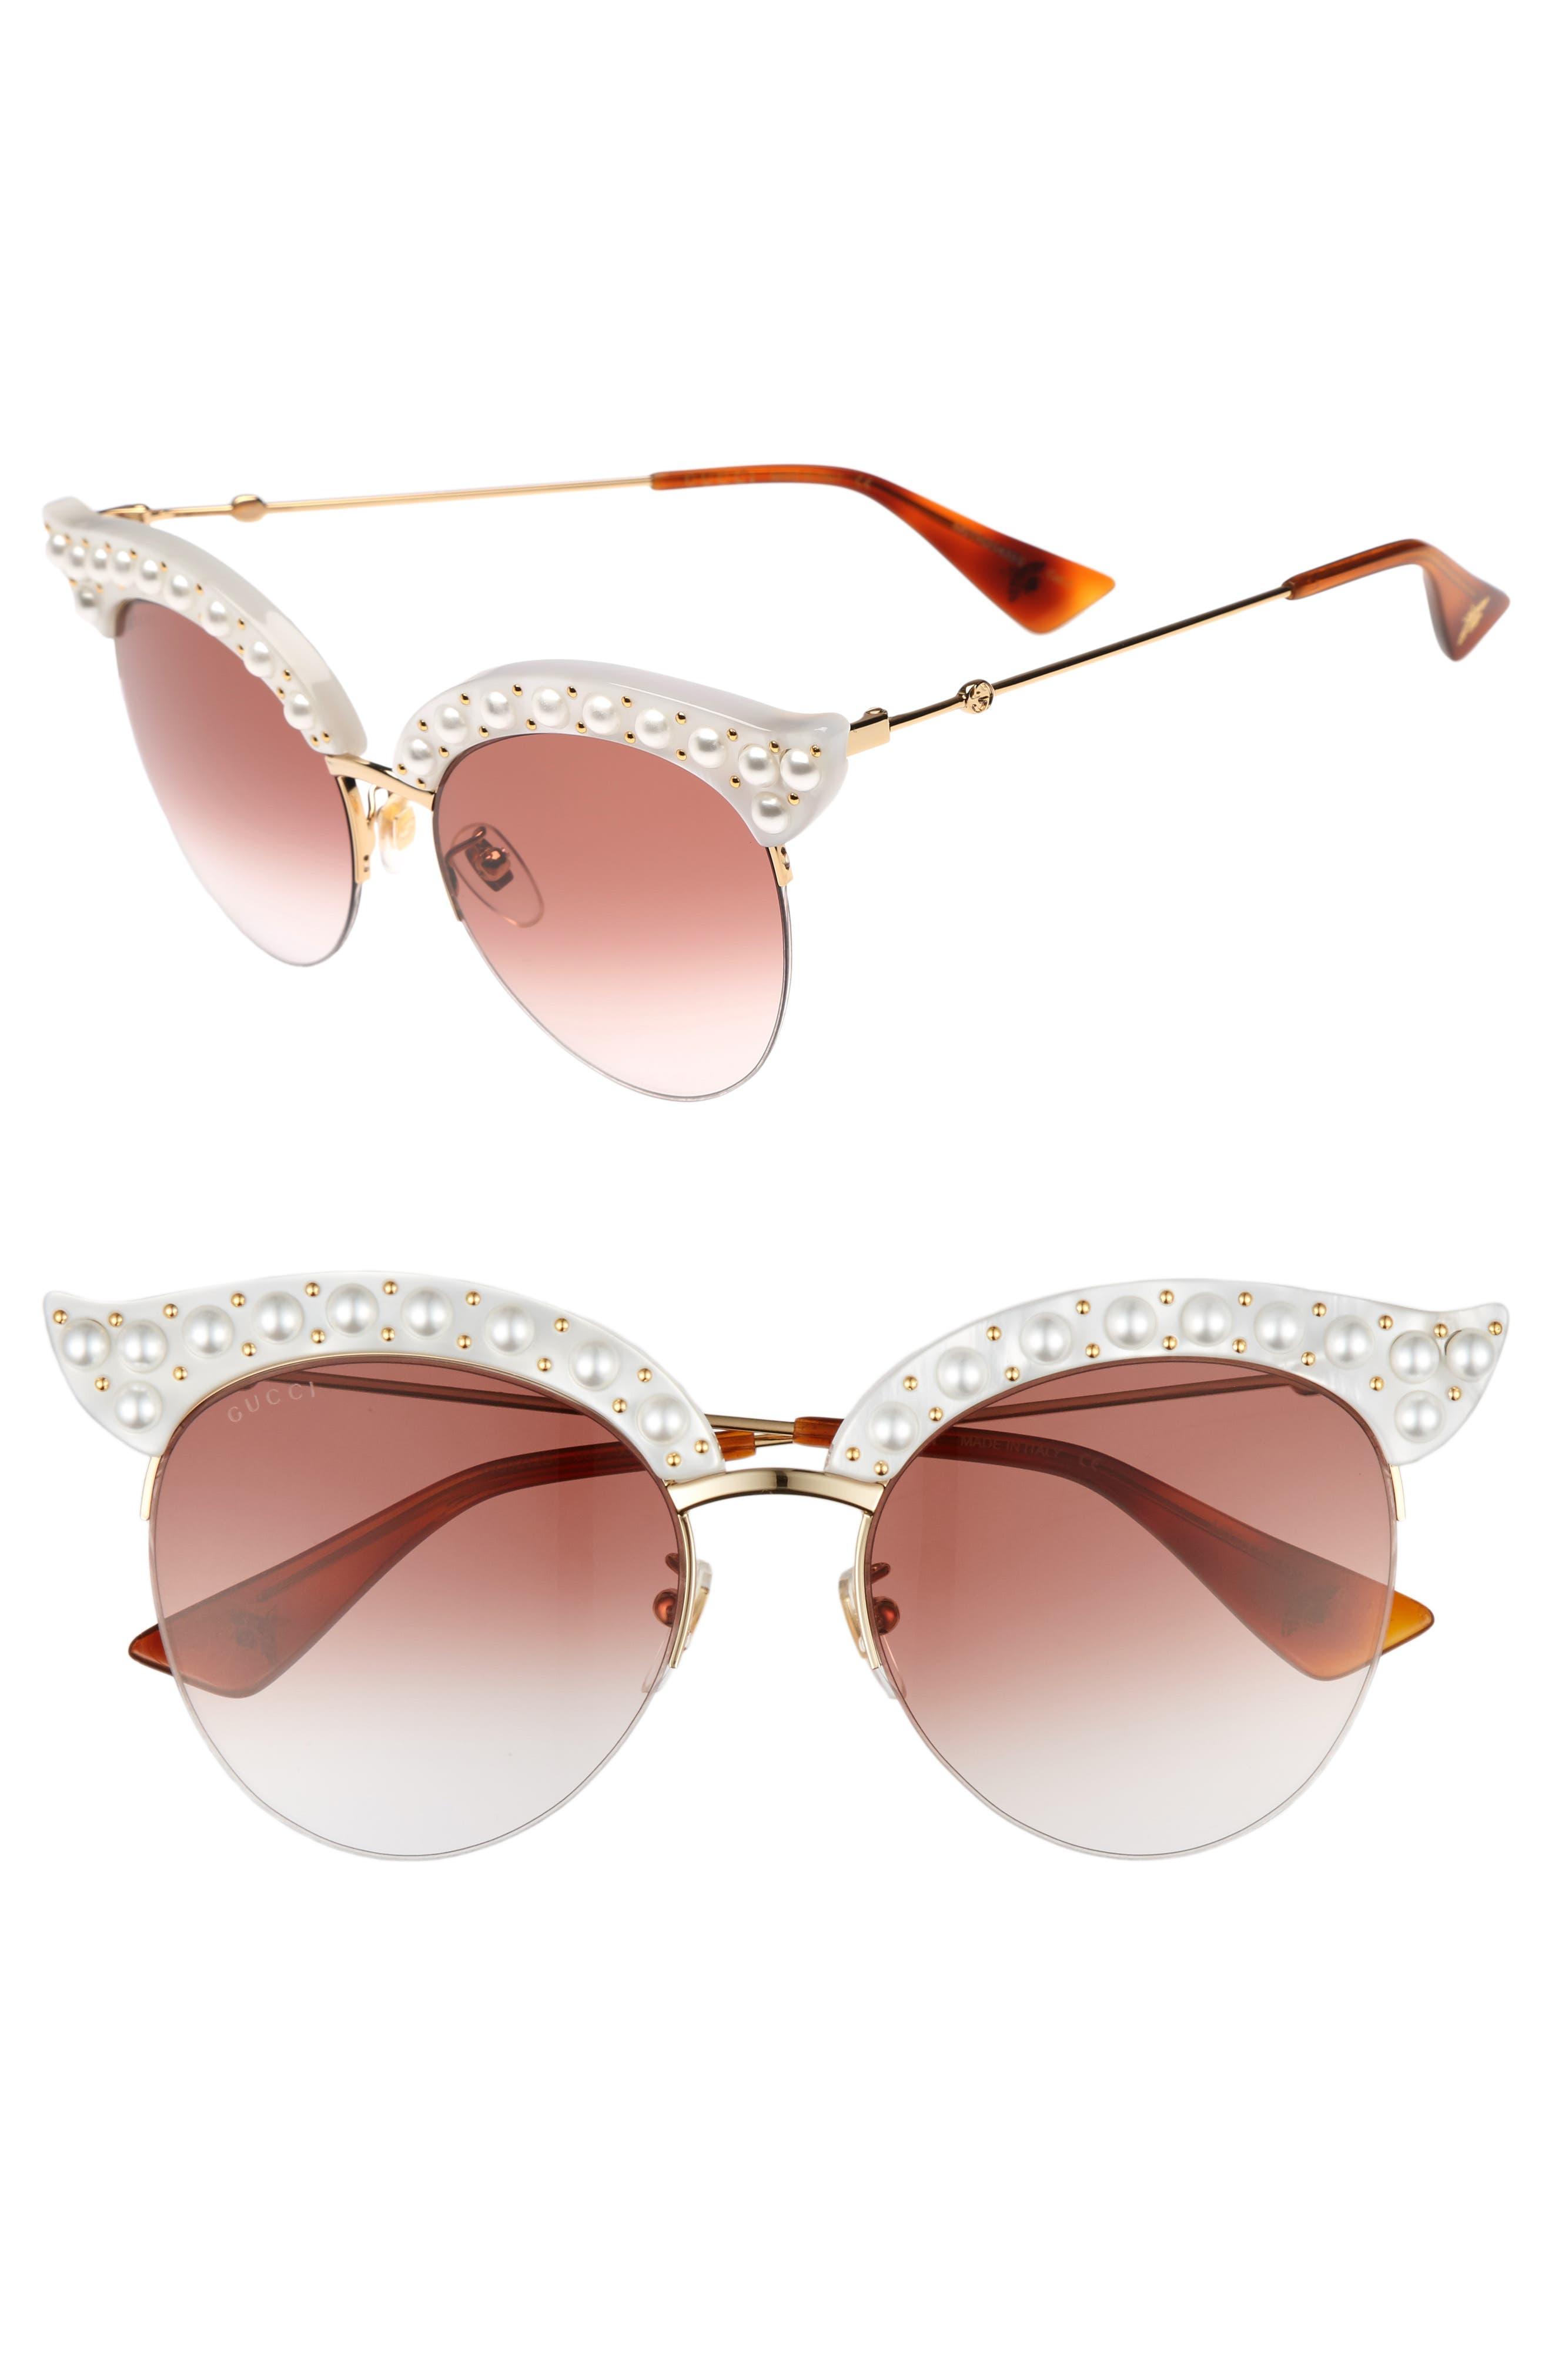 53mm Embellished Cat Eye Sunglasses,                             Main thumbnail 1, color,                             White